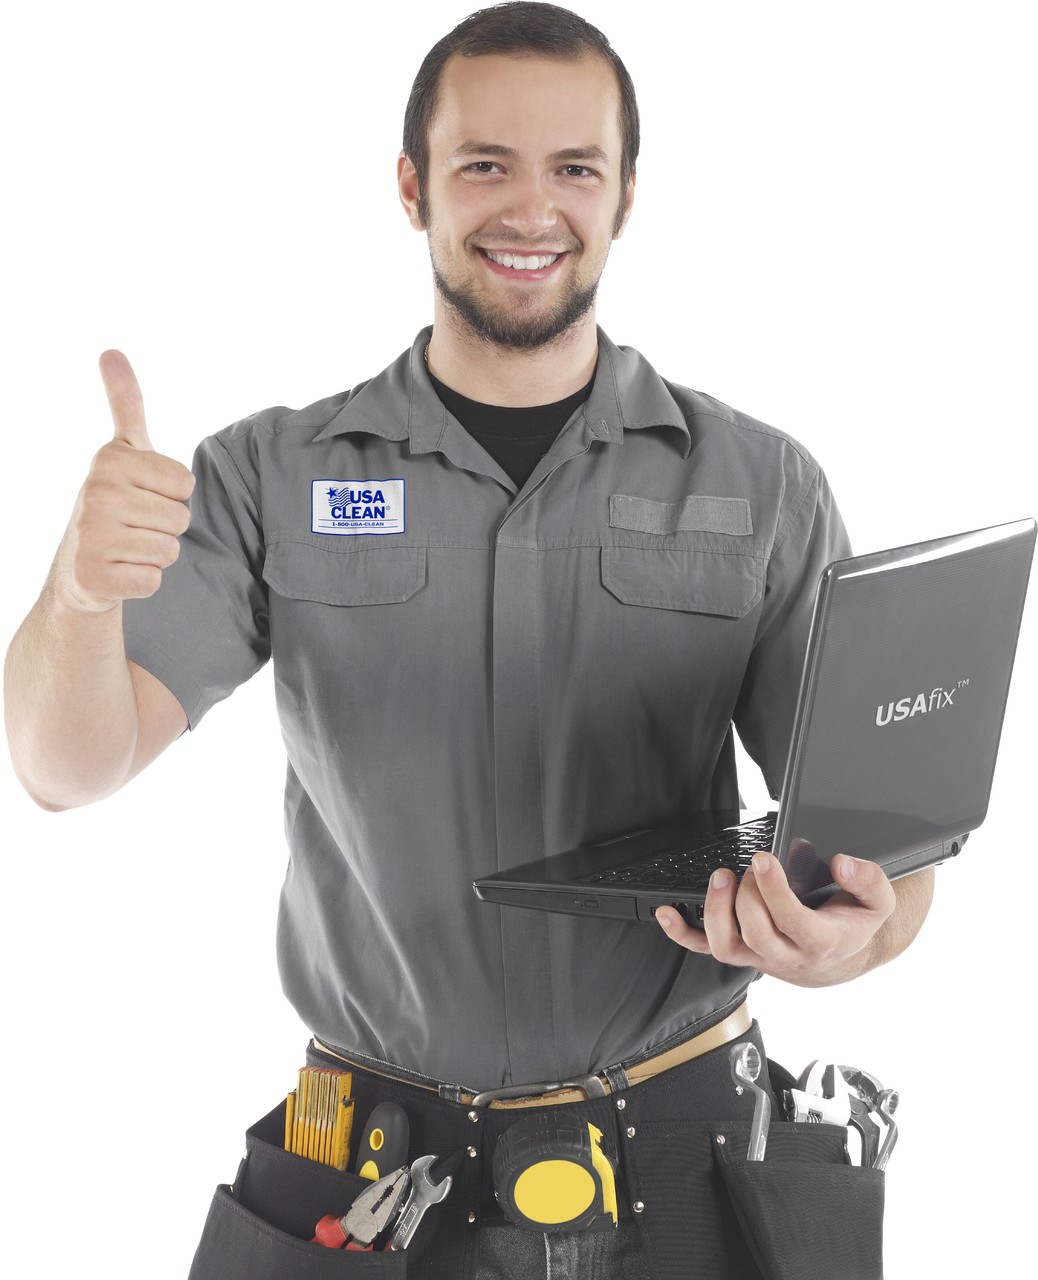 USAC technician